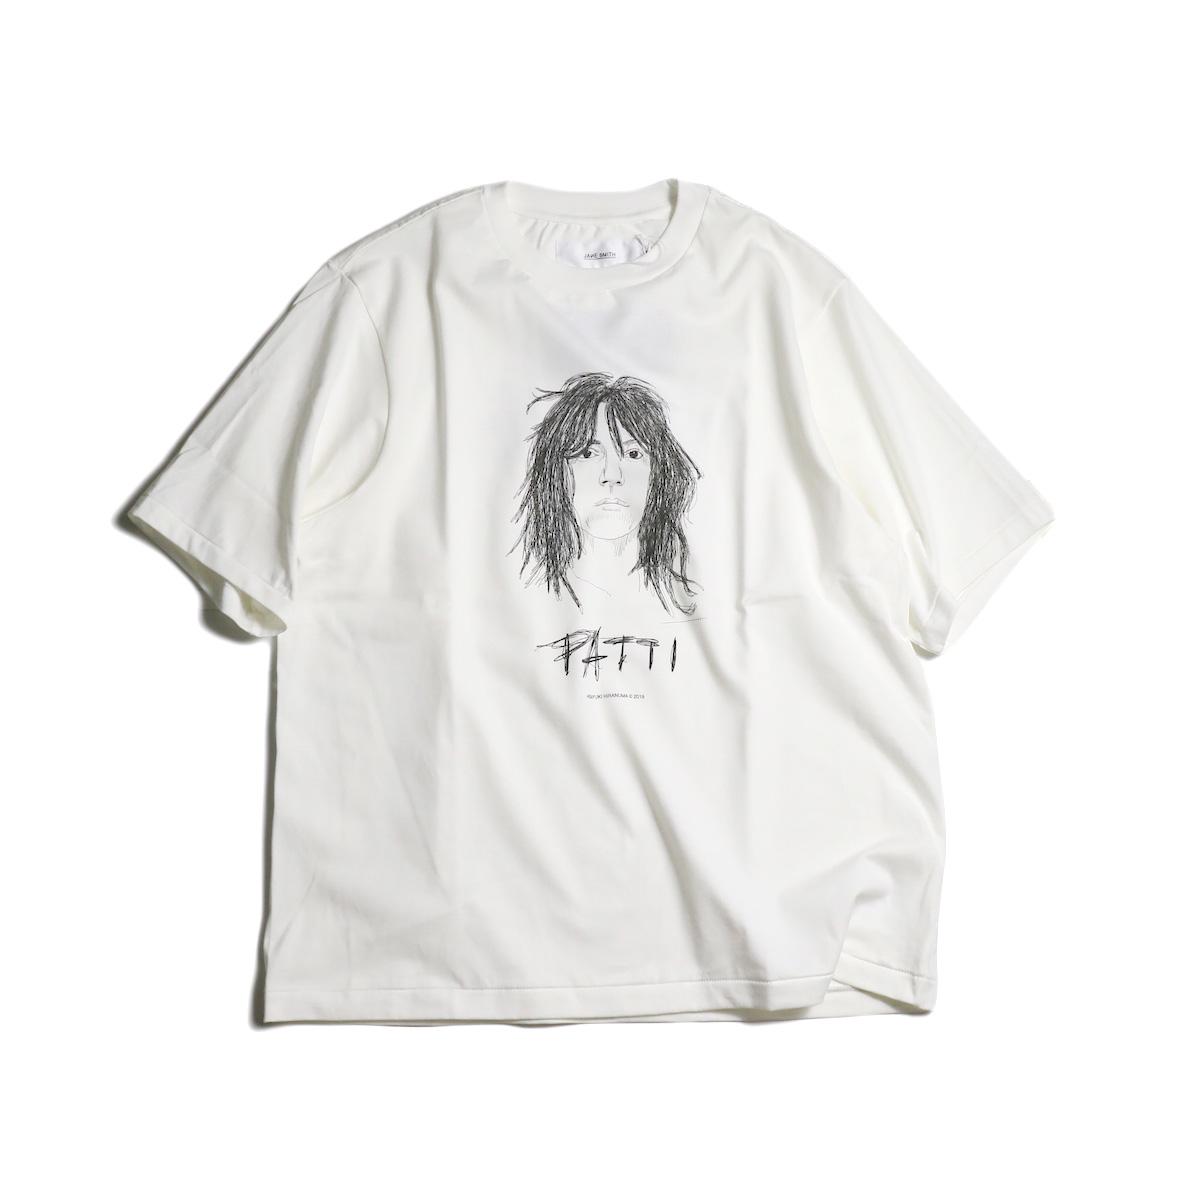 JANE SMITH / PATTI S/S Tee